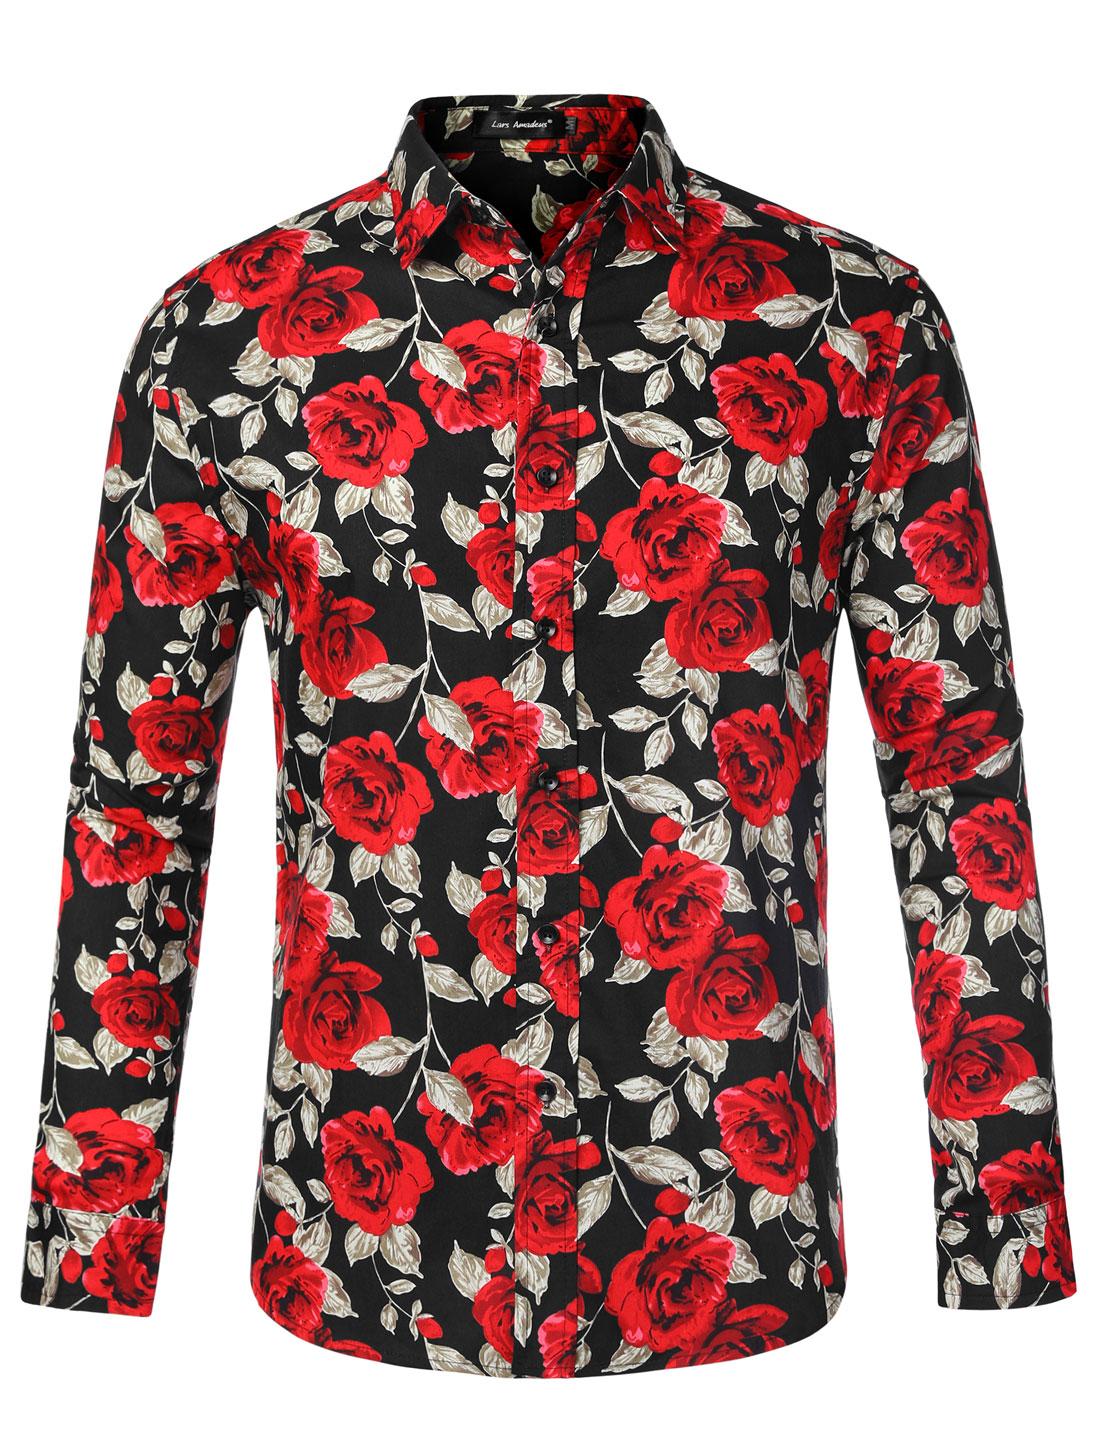 Men Floral Hawaiian Palm Flower Printed Shirt Black Rose L (US 42)